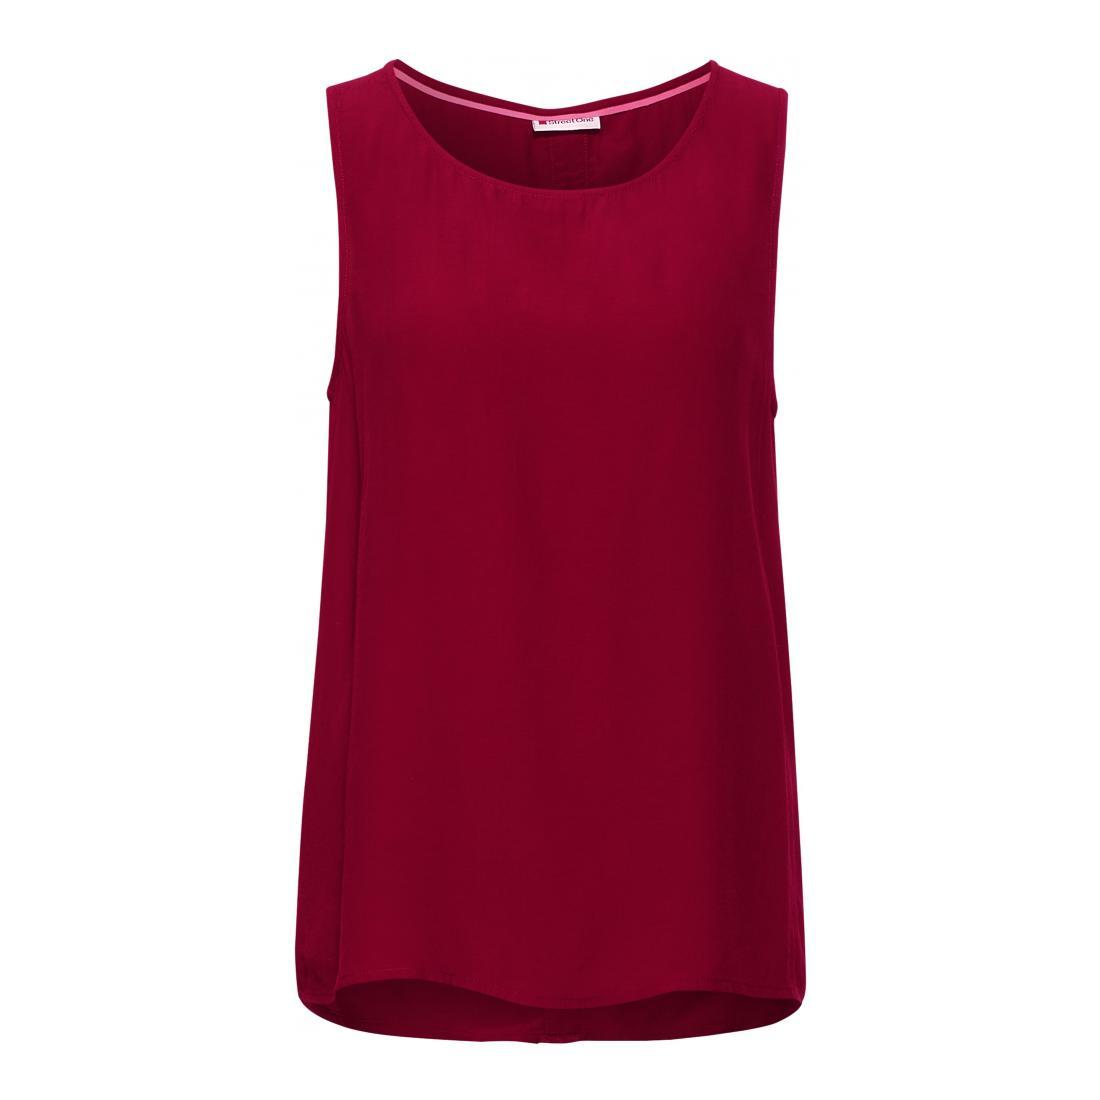 Street One Tops Damen LTD QR Solid blousetop w